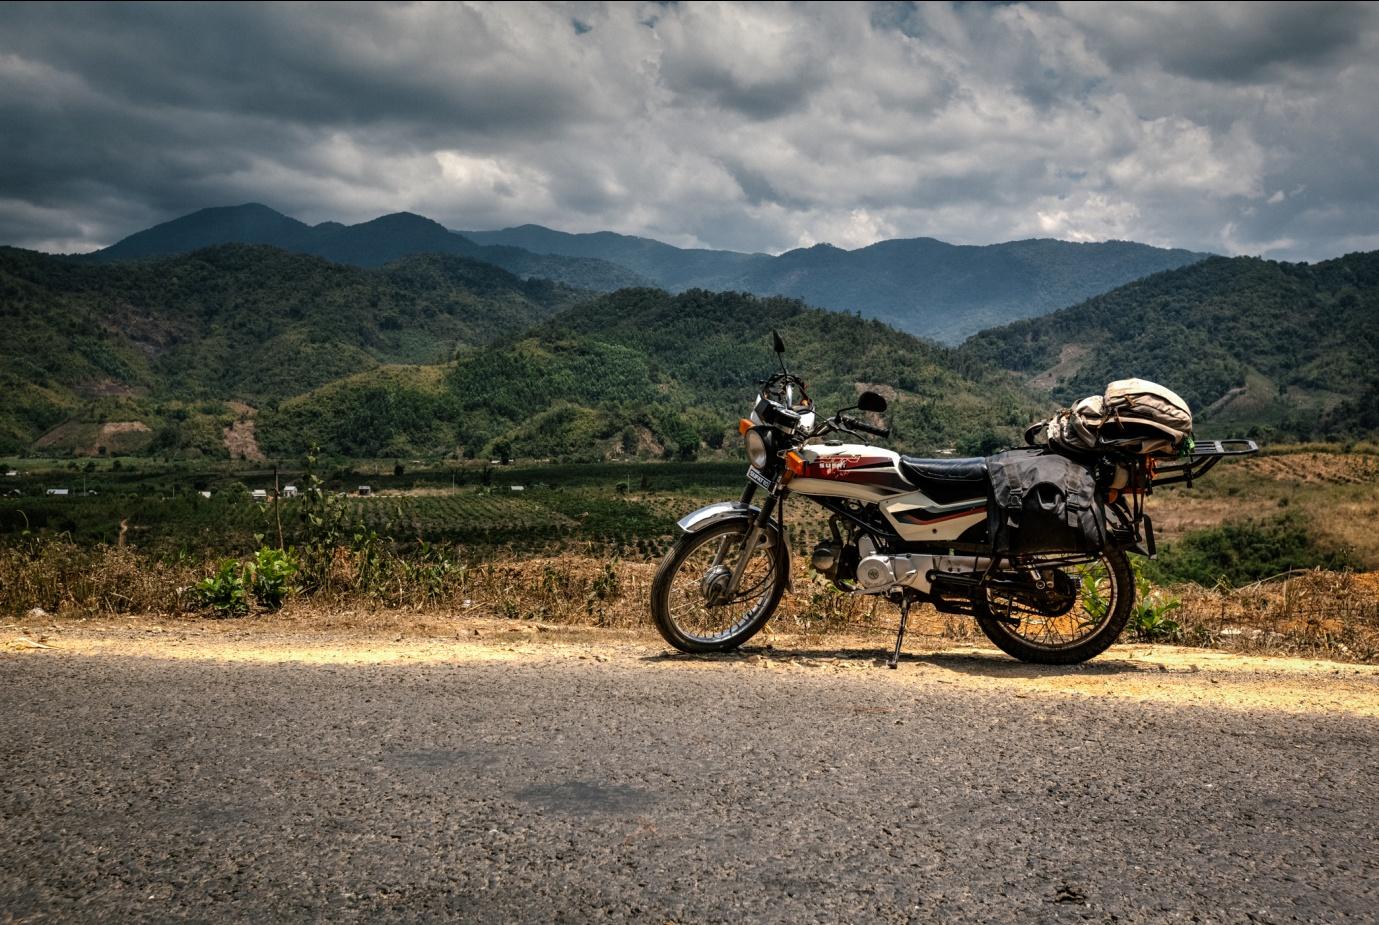 Reasons to travel Vietnam by motorbike